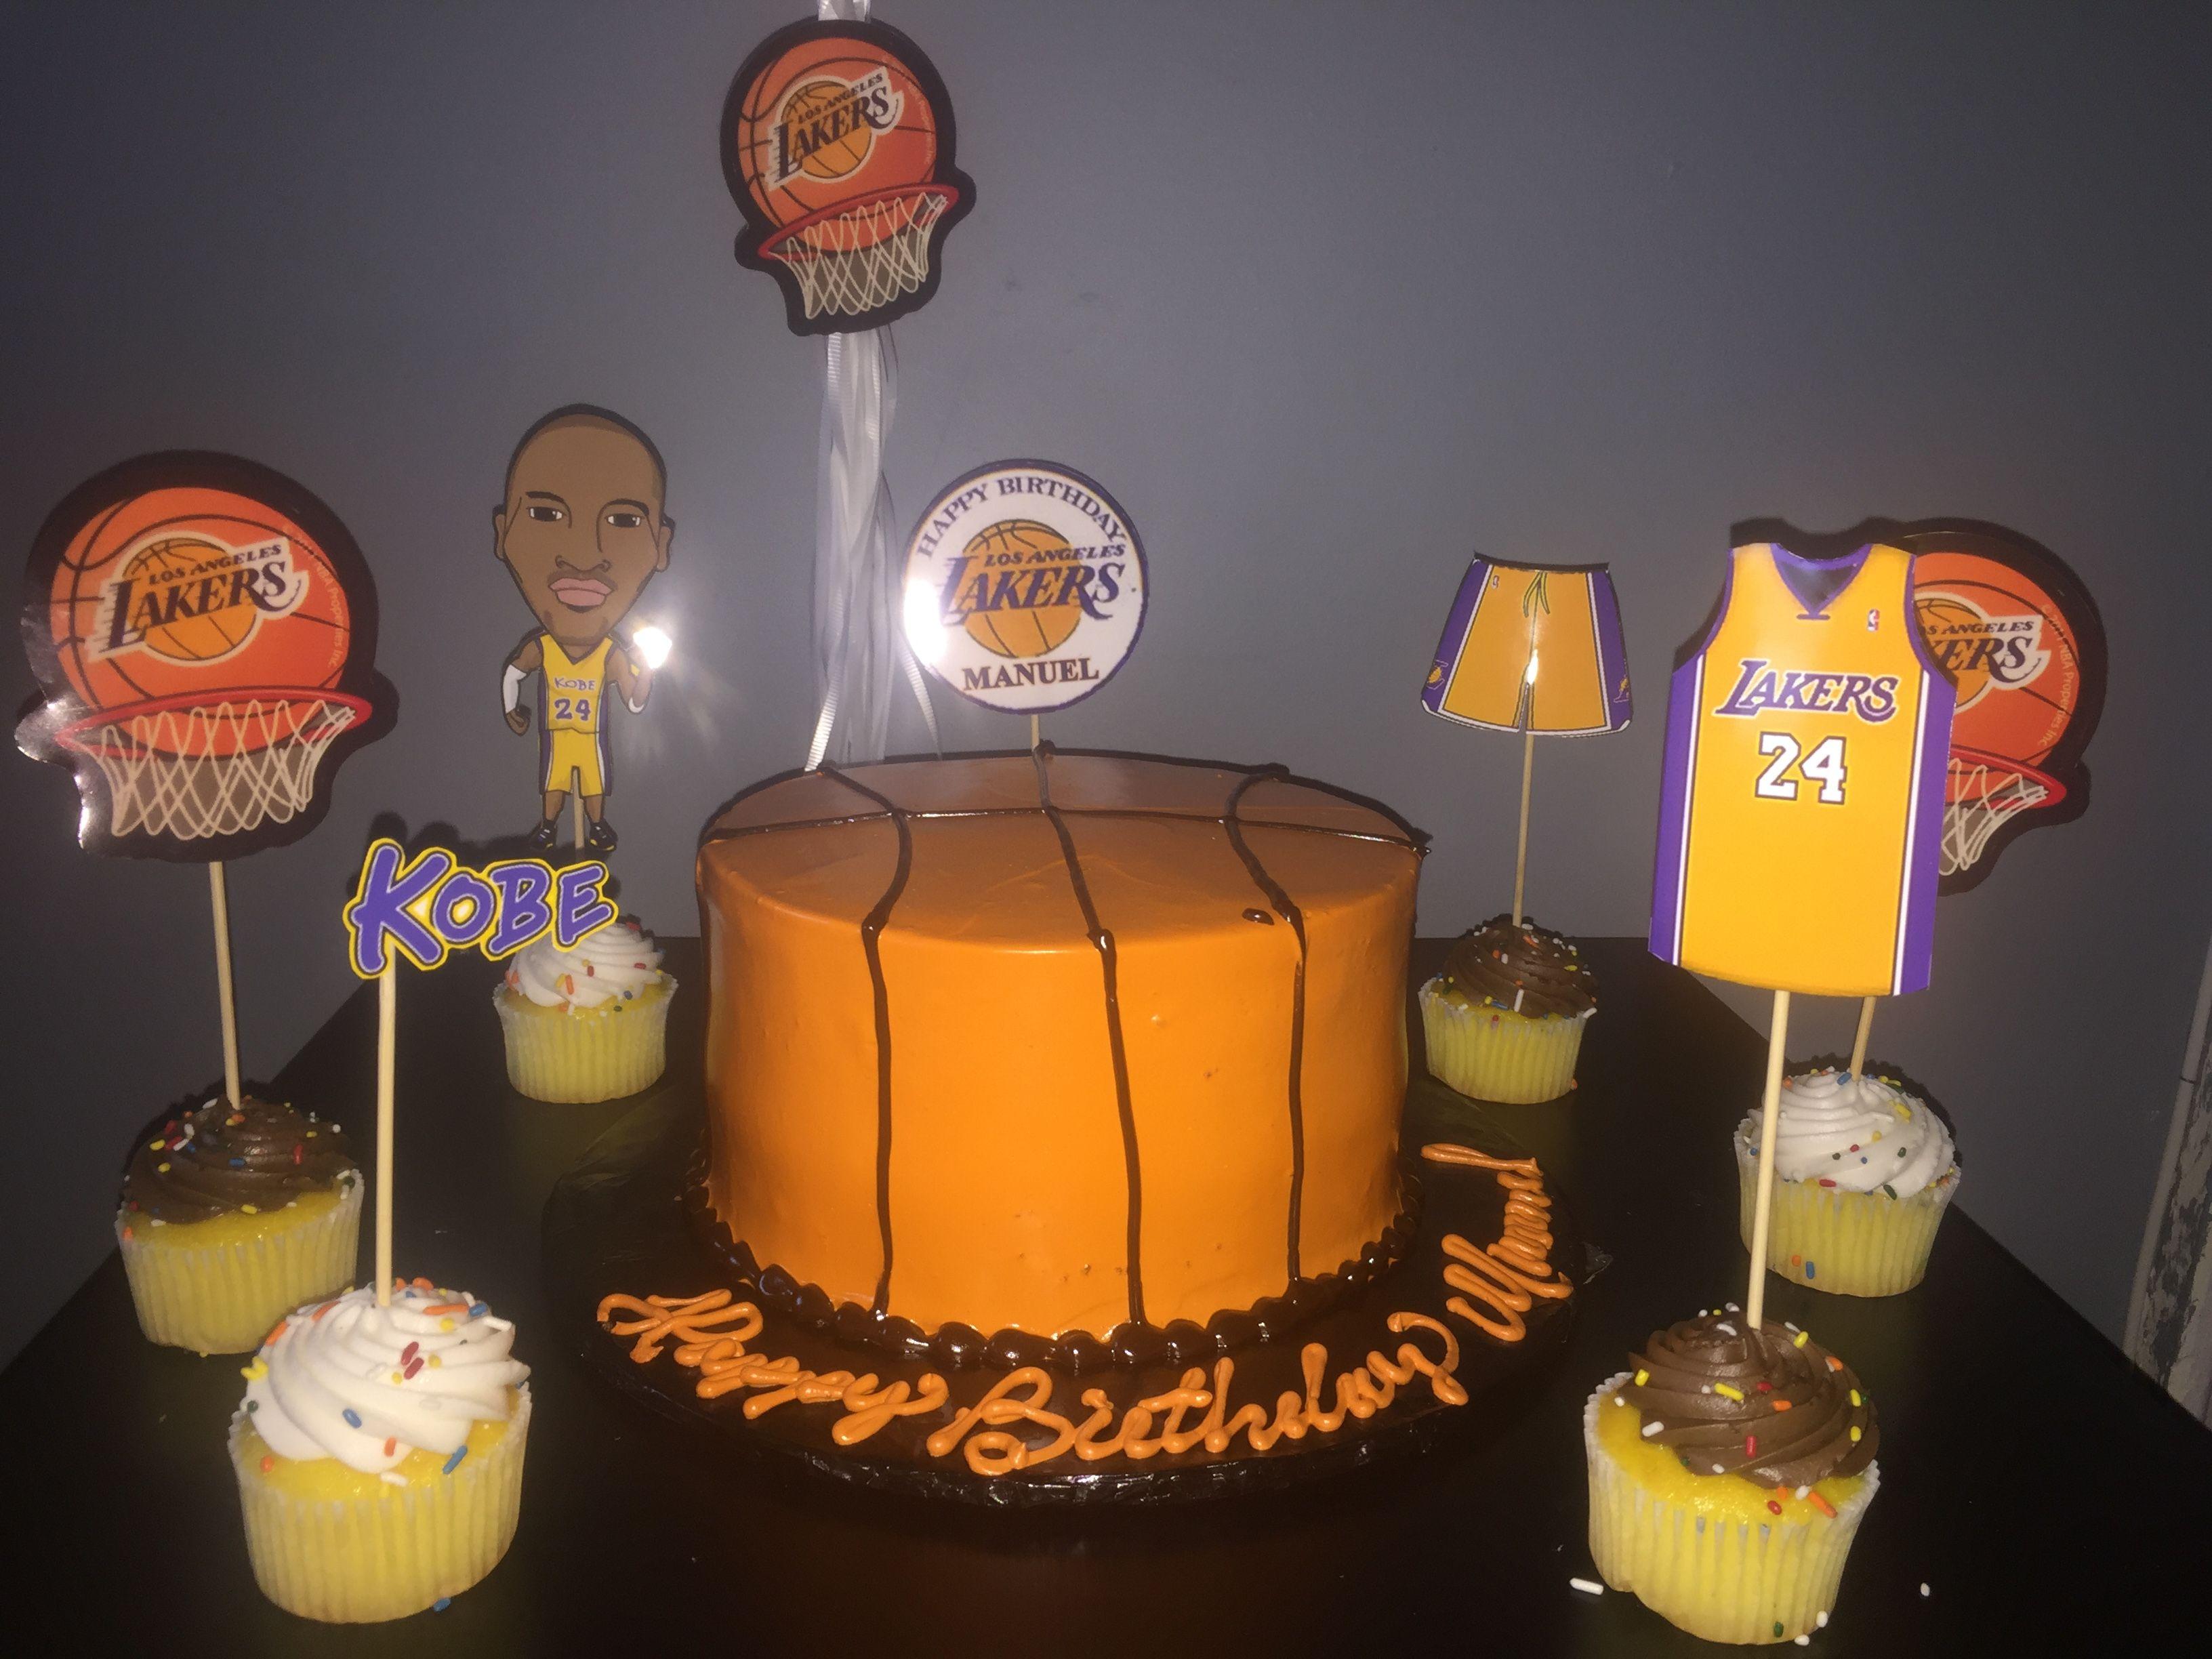 Basketball Birthday Cake & Kobe Bryant topped Cupcakes